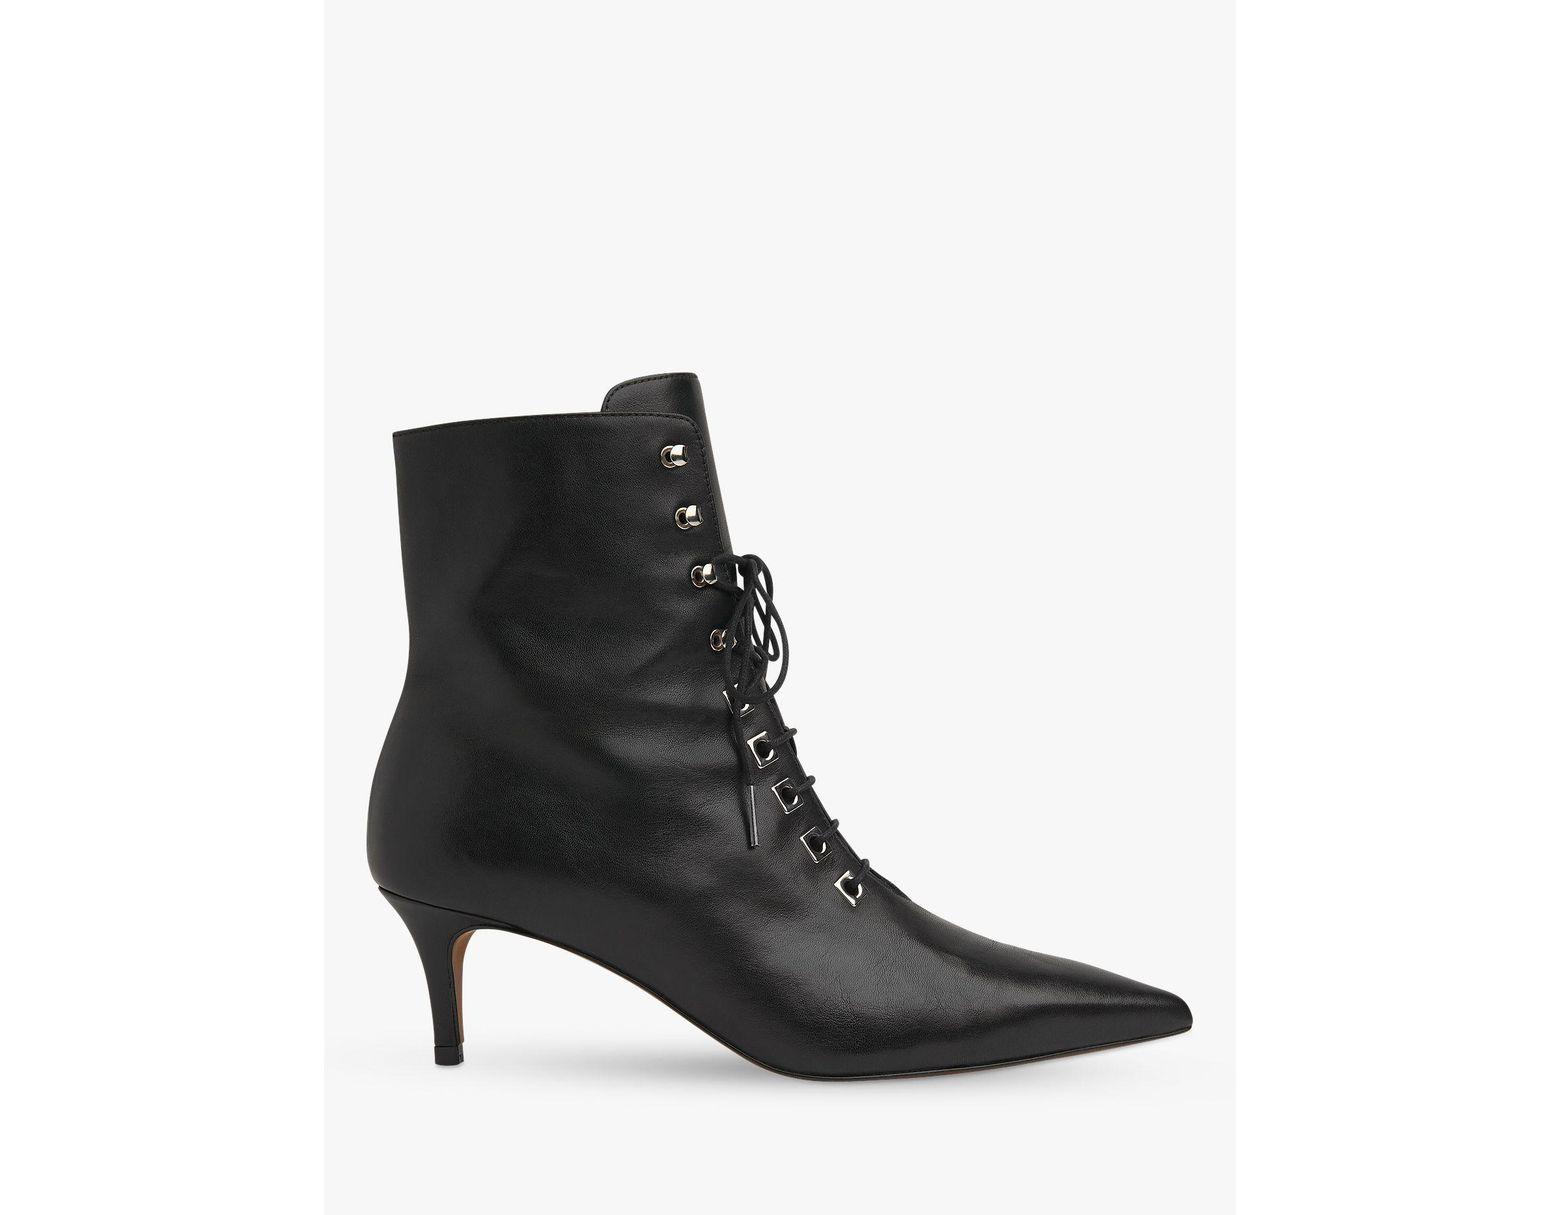 b21234155ef Black Women's Celeste Leather Kitten Heel Booties